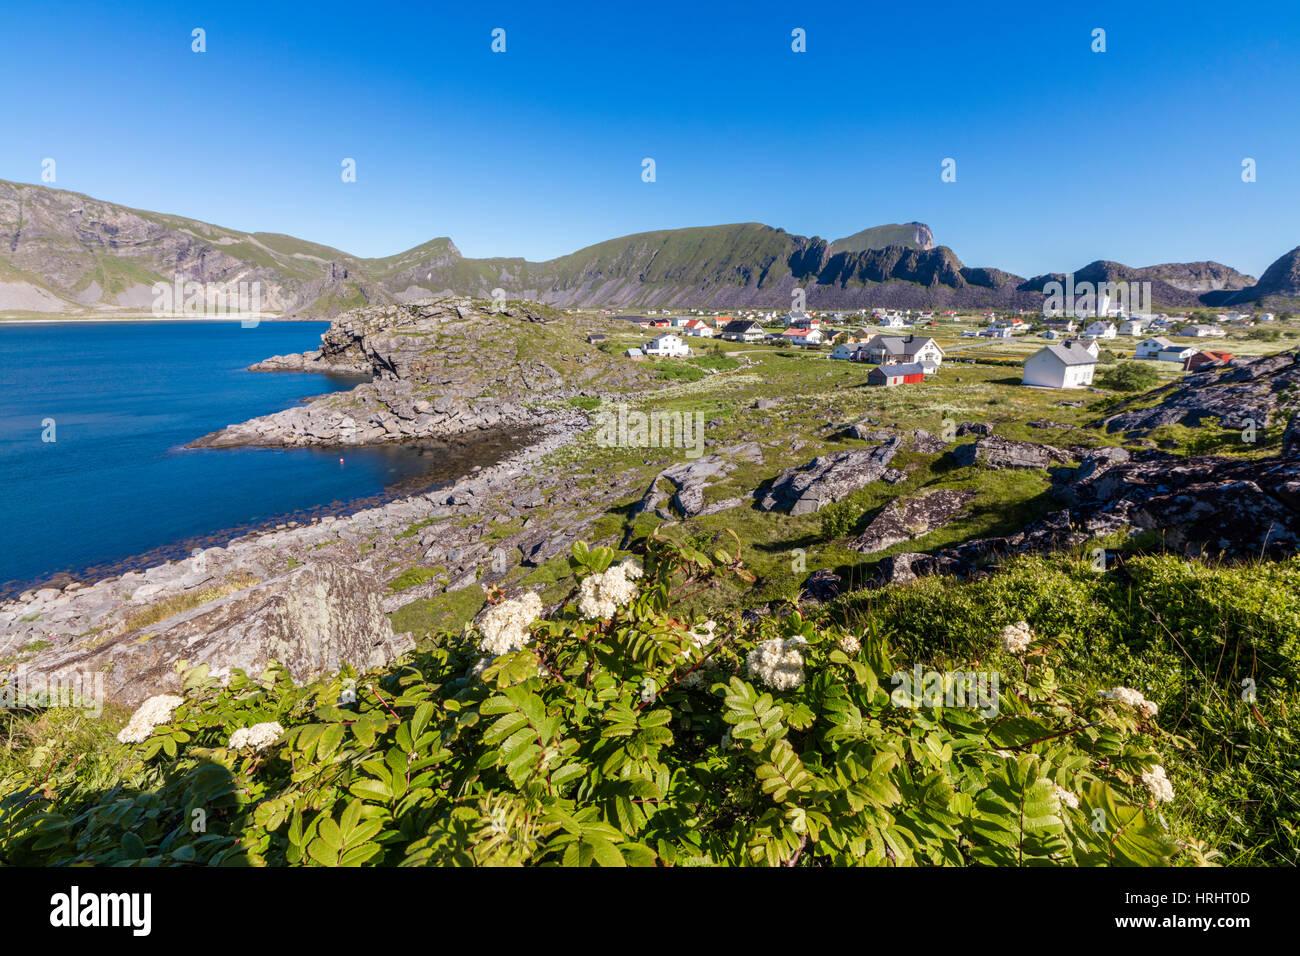 Green meadows frame the village of Sorland surrounded by sea, Vaeroy Island, Nordland county, Lofoten archipelago, - Stock Image